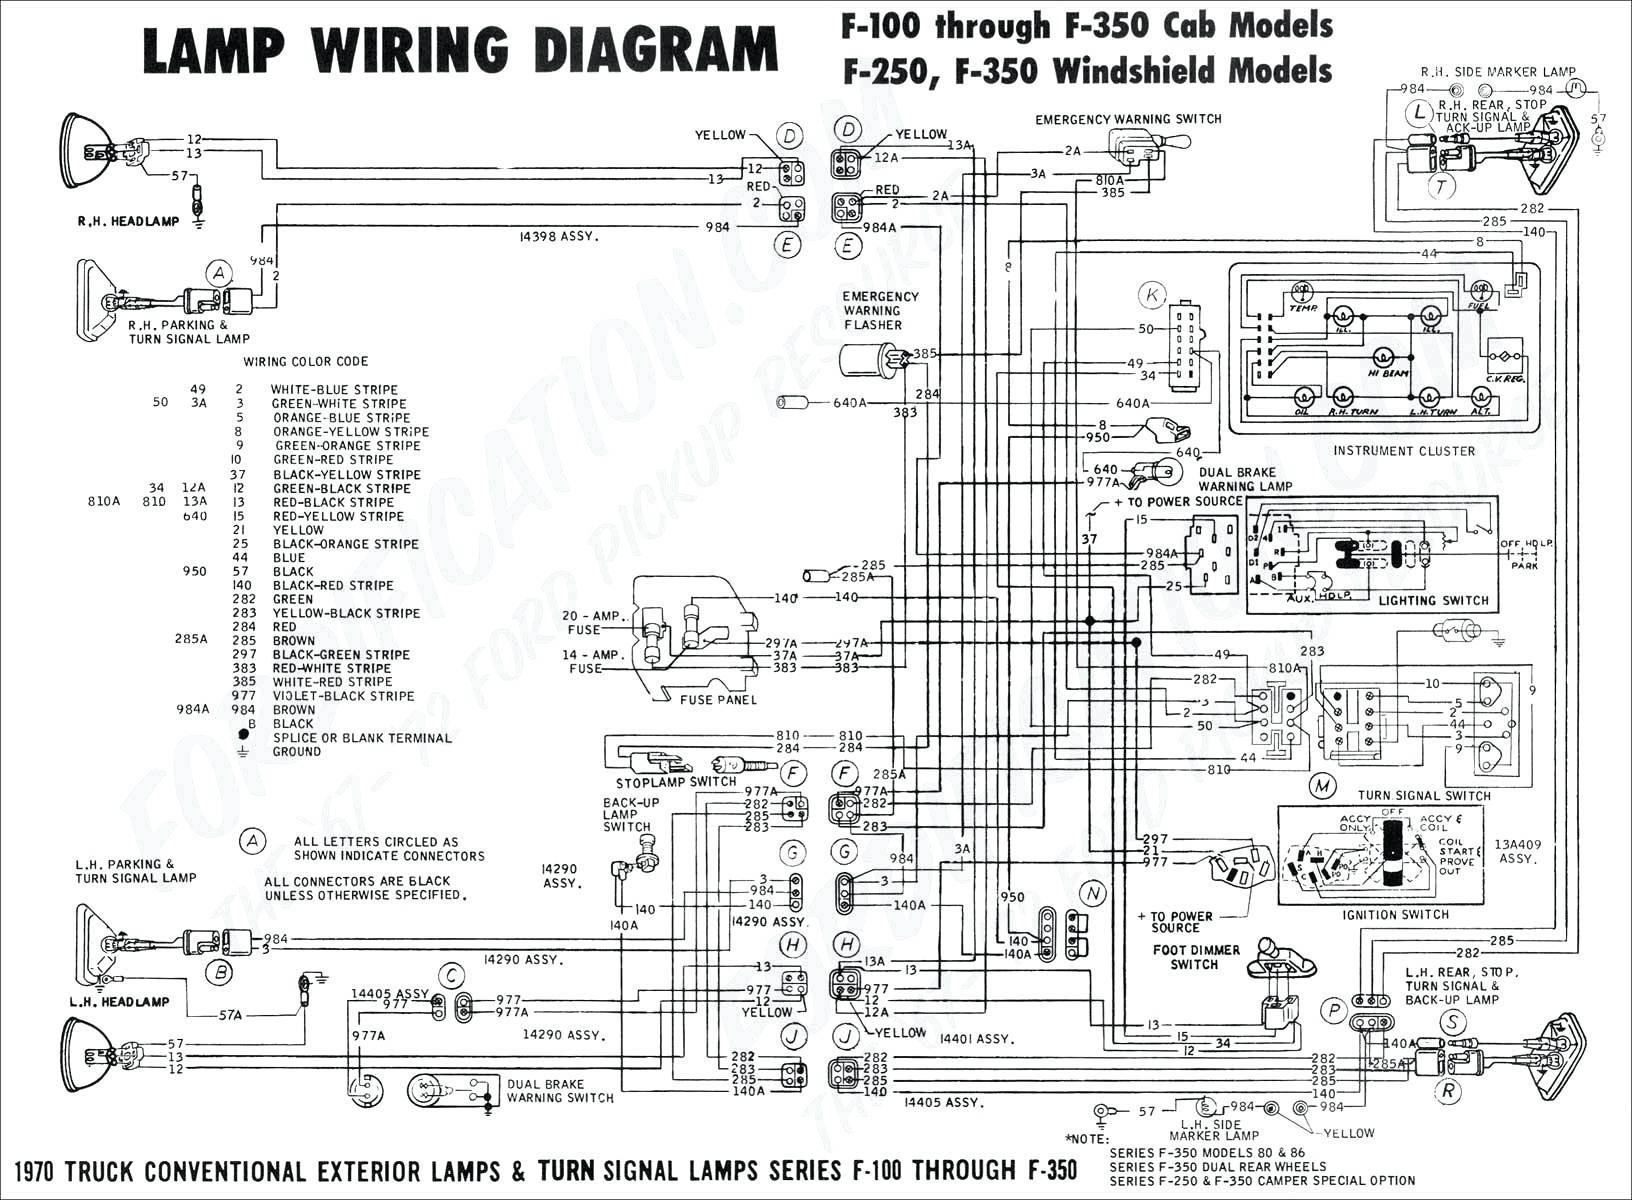 98 ford Ranger Engine Diagram 86 Ranger Wiring Diagram Daily Update Wiring Diagram Of 98 ford Ranger Engine Diagram